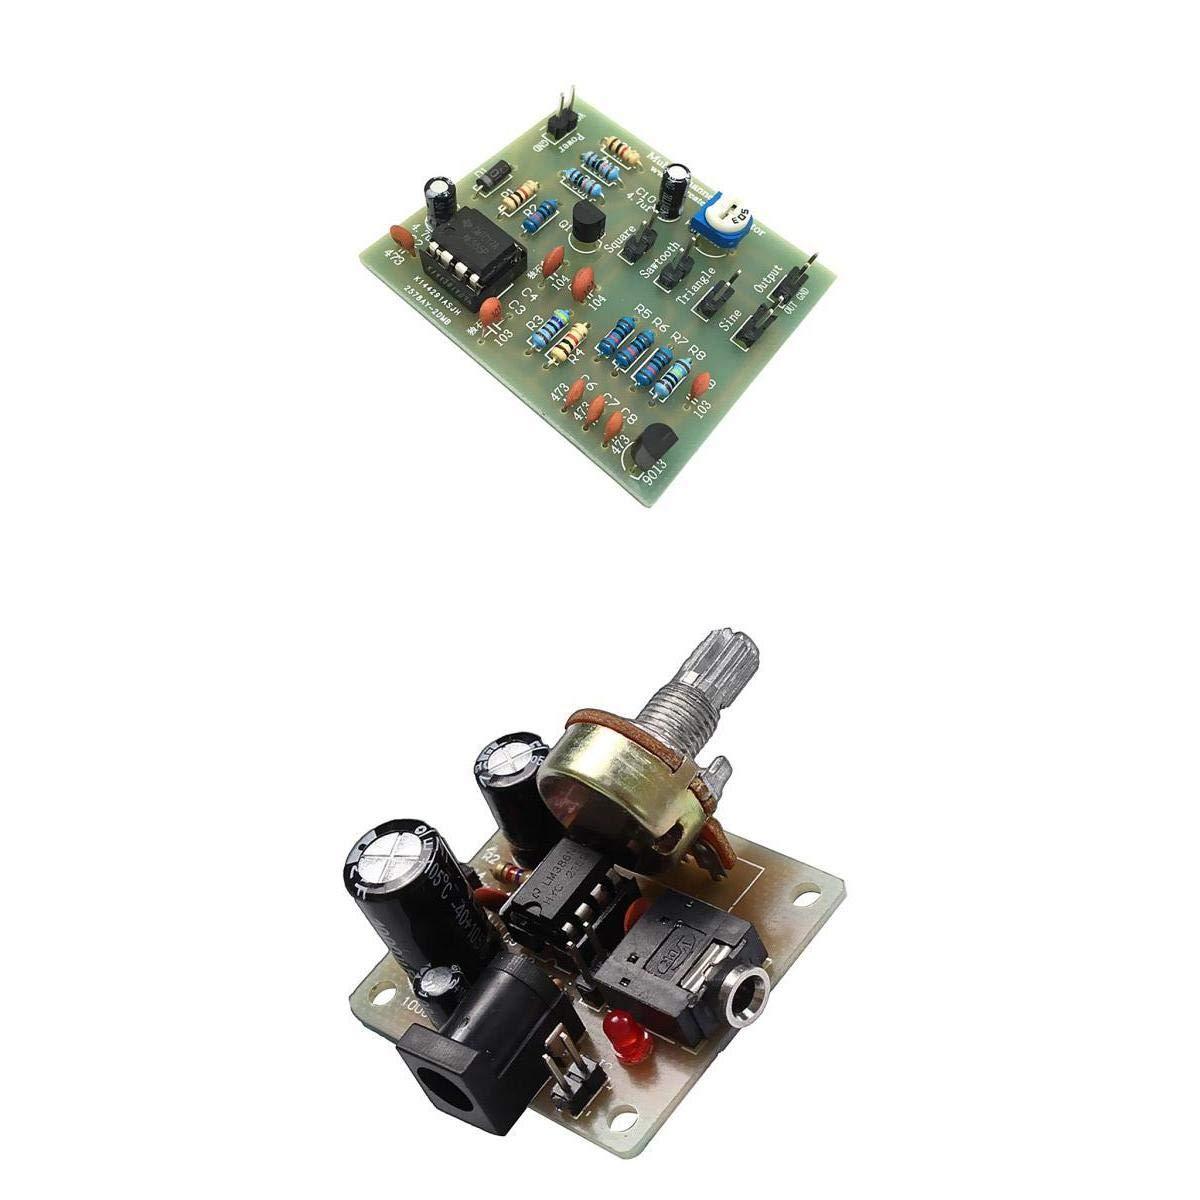 Baoblaze 1 piece LM386 Mini Amplifier Board + 1 piece NE555 Multi-Channel Waveform Generator Module SETS